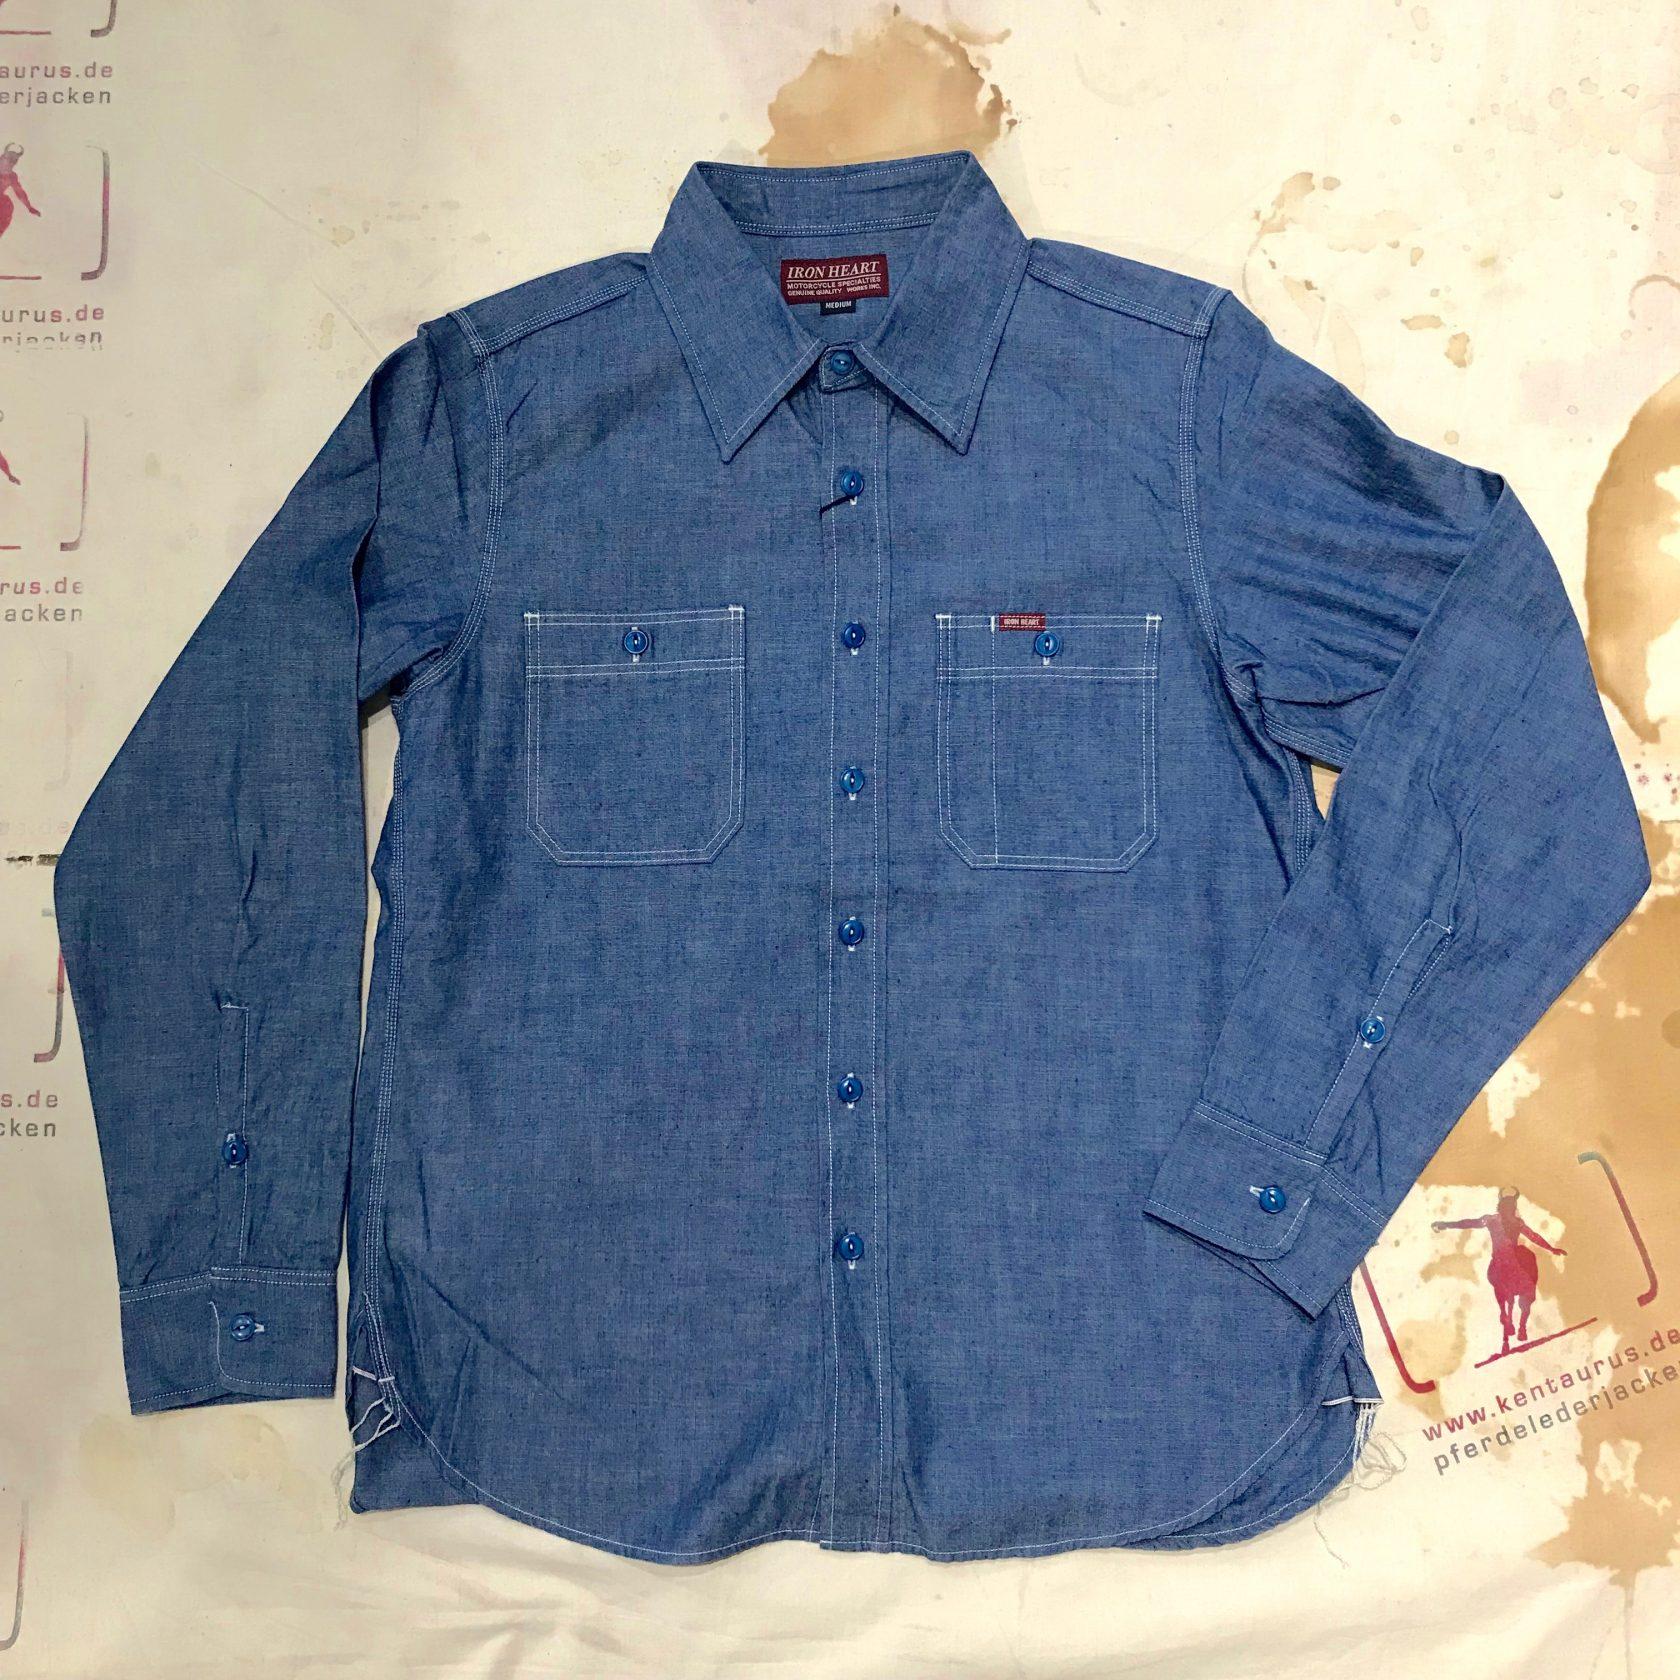 IHSH-133 indigo chambray work shirt